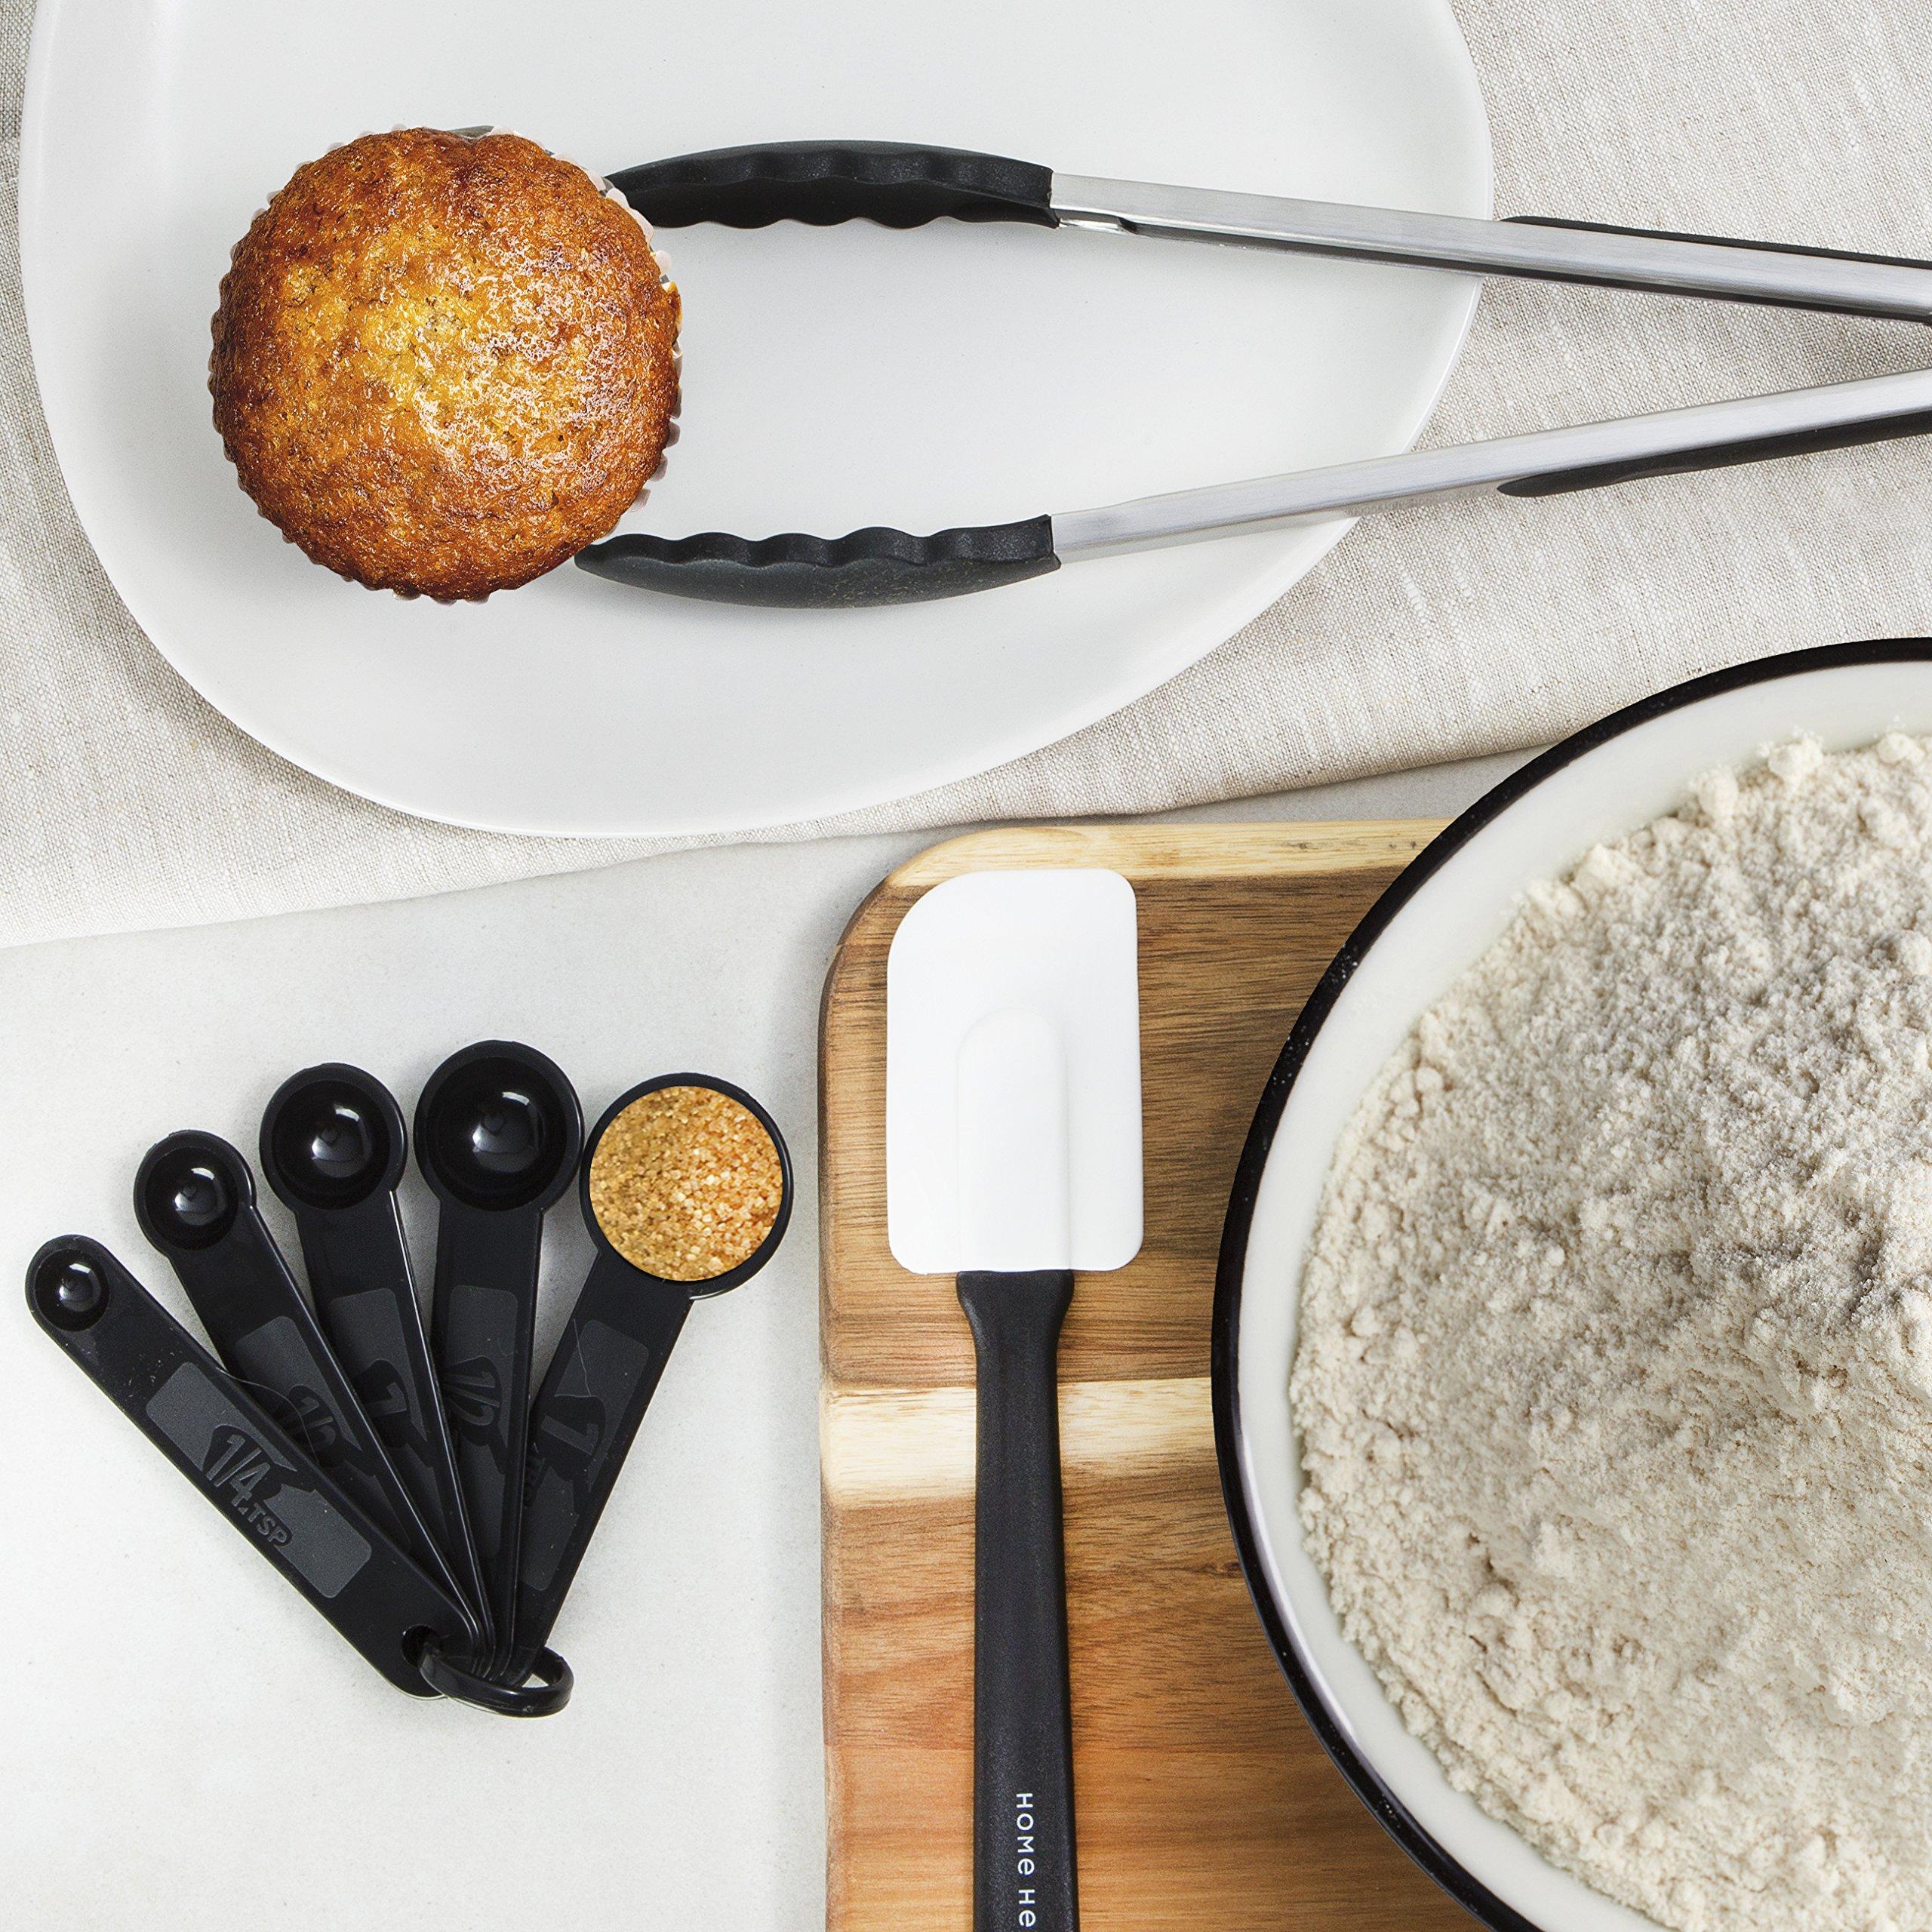 Kitchen Utensil Set - 23 Nylon Cooking Utensils - Kitchen Utensils with Spatula - Kitchen Gadgets Cookware Set - Best Kitchen Tool Set Gift by HomeHero by HomeHero (Image #3)